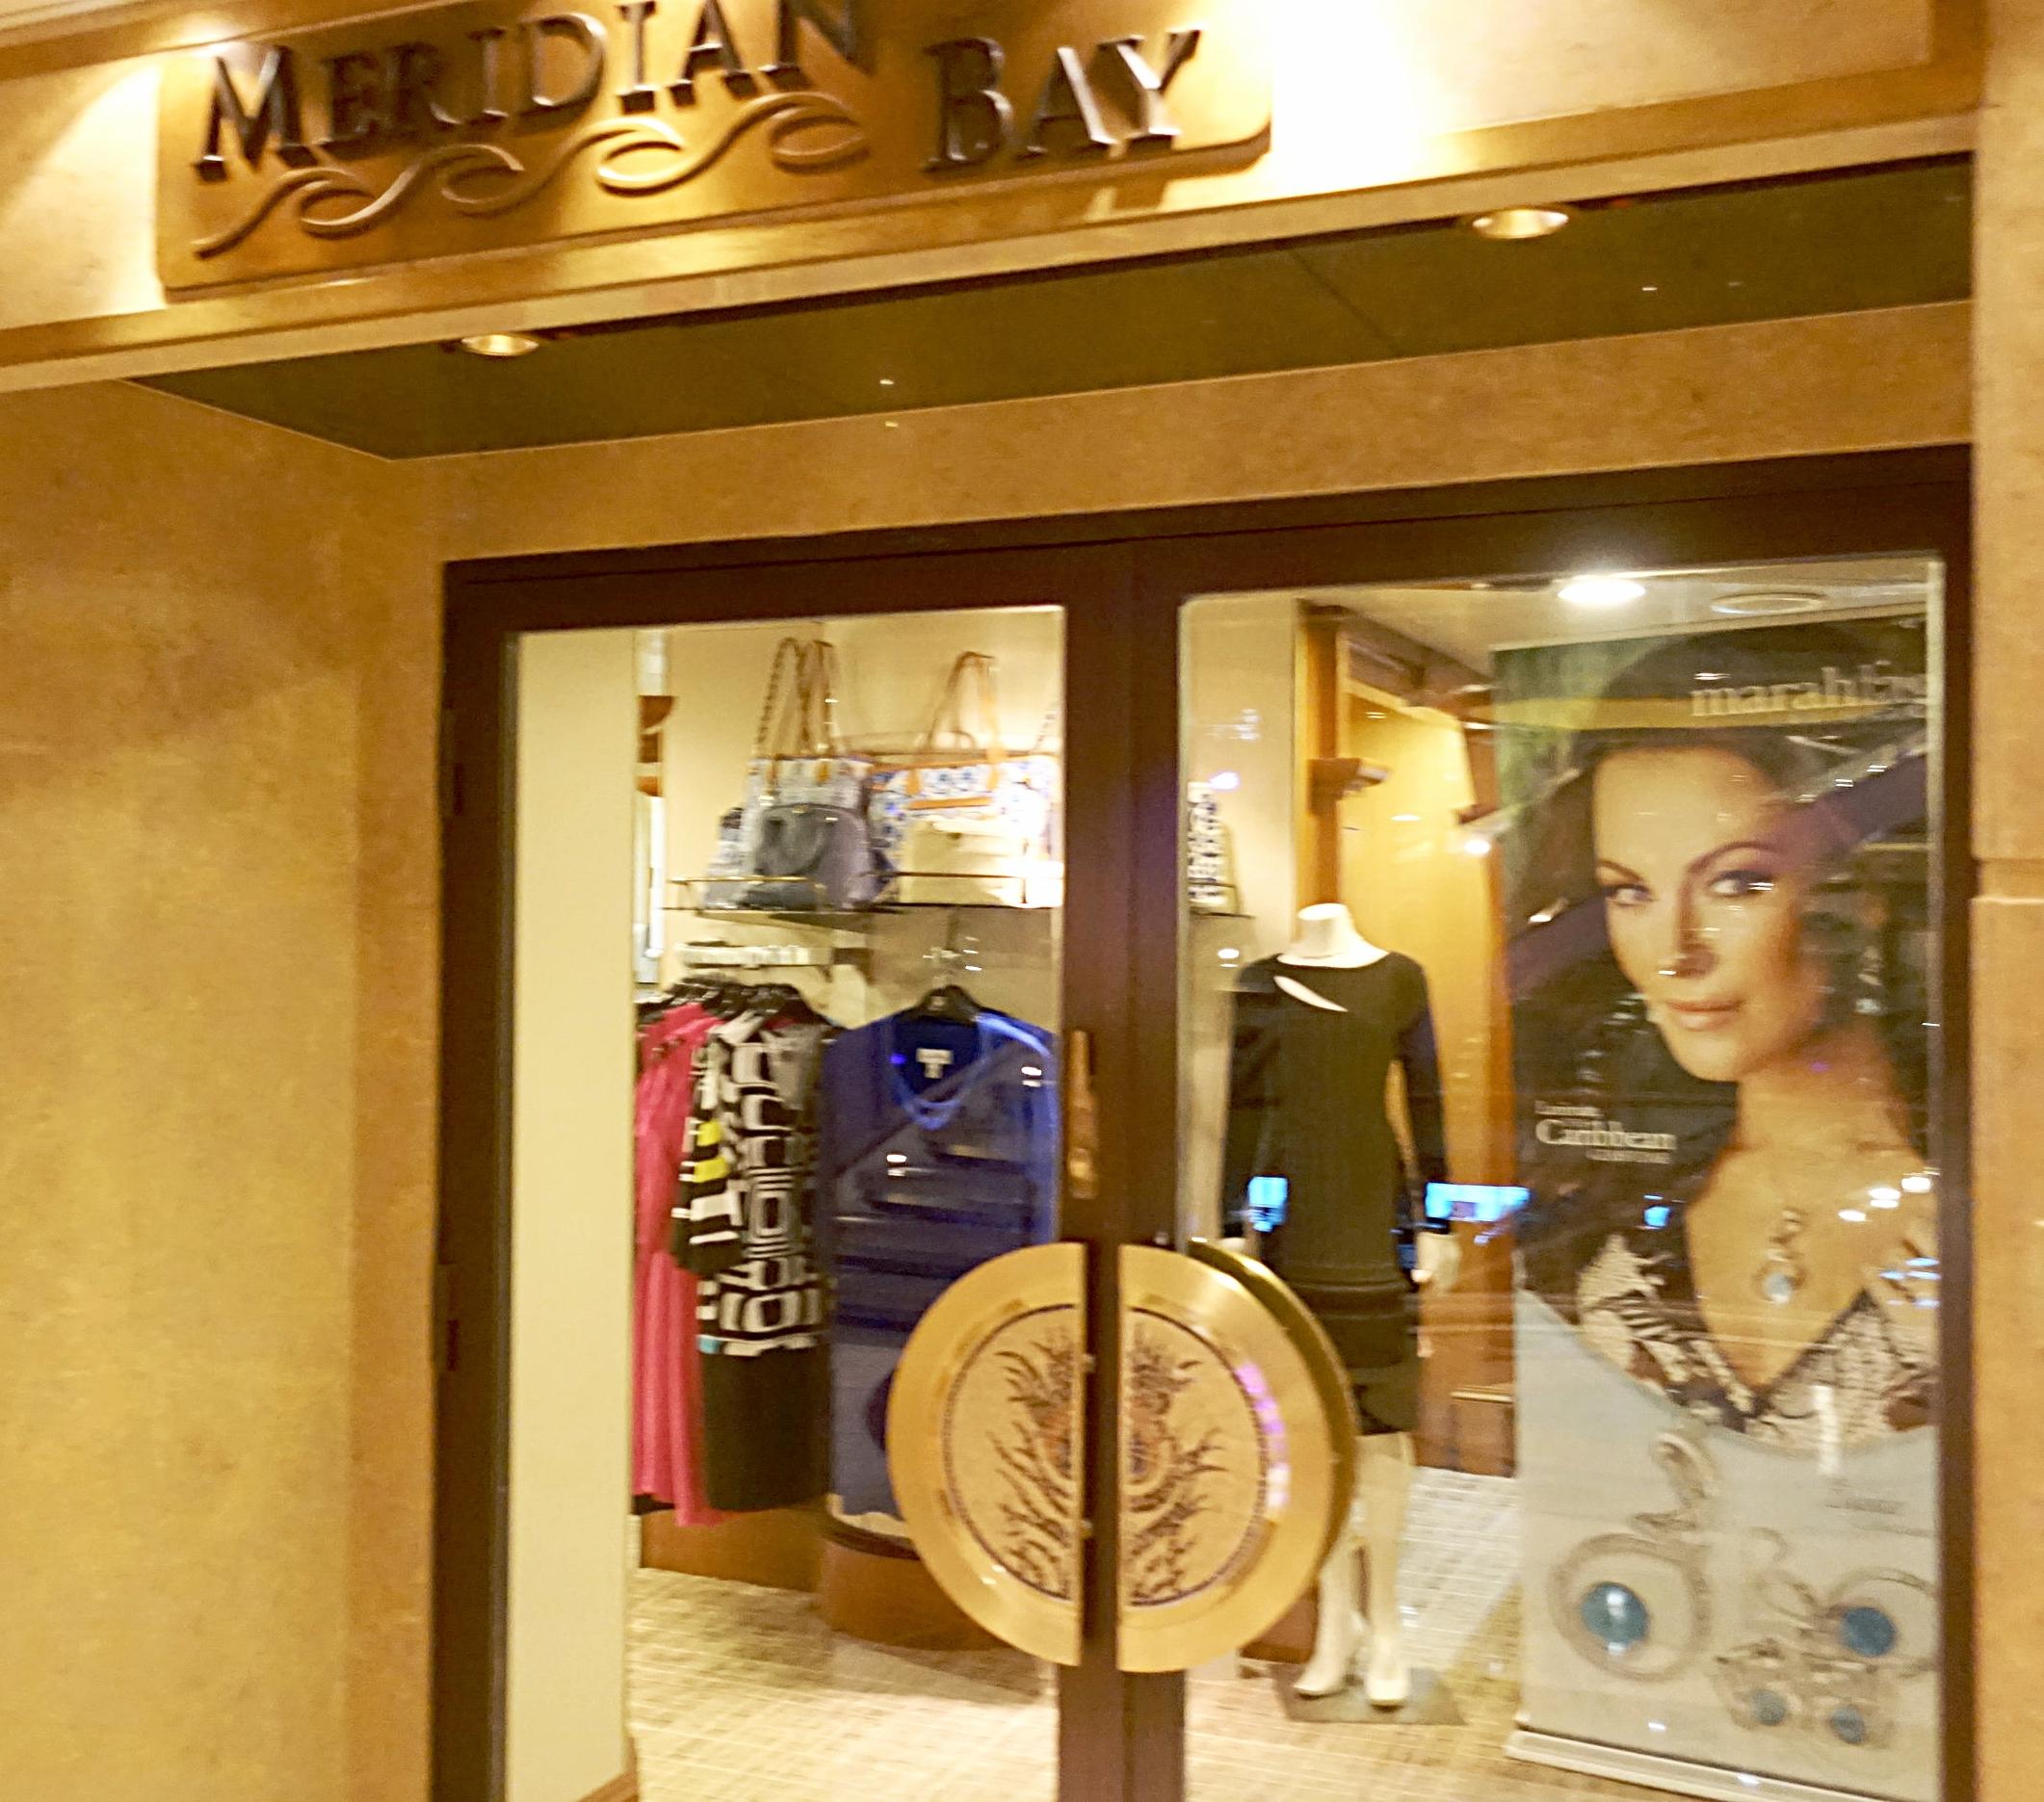 Meridian Bay shop.